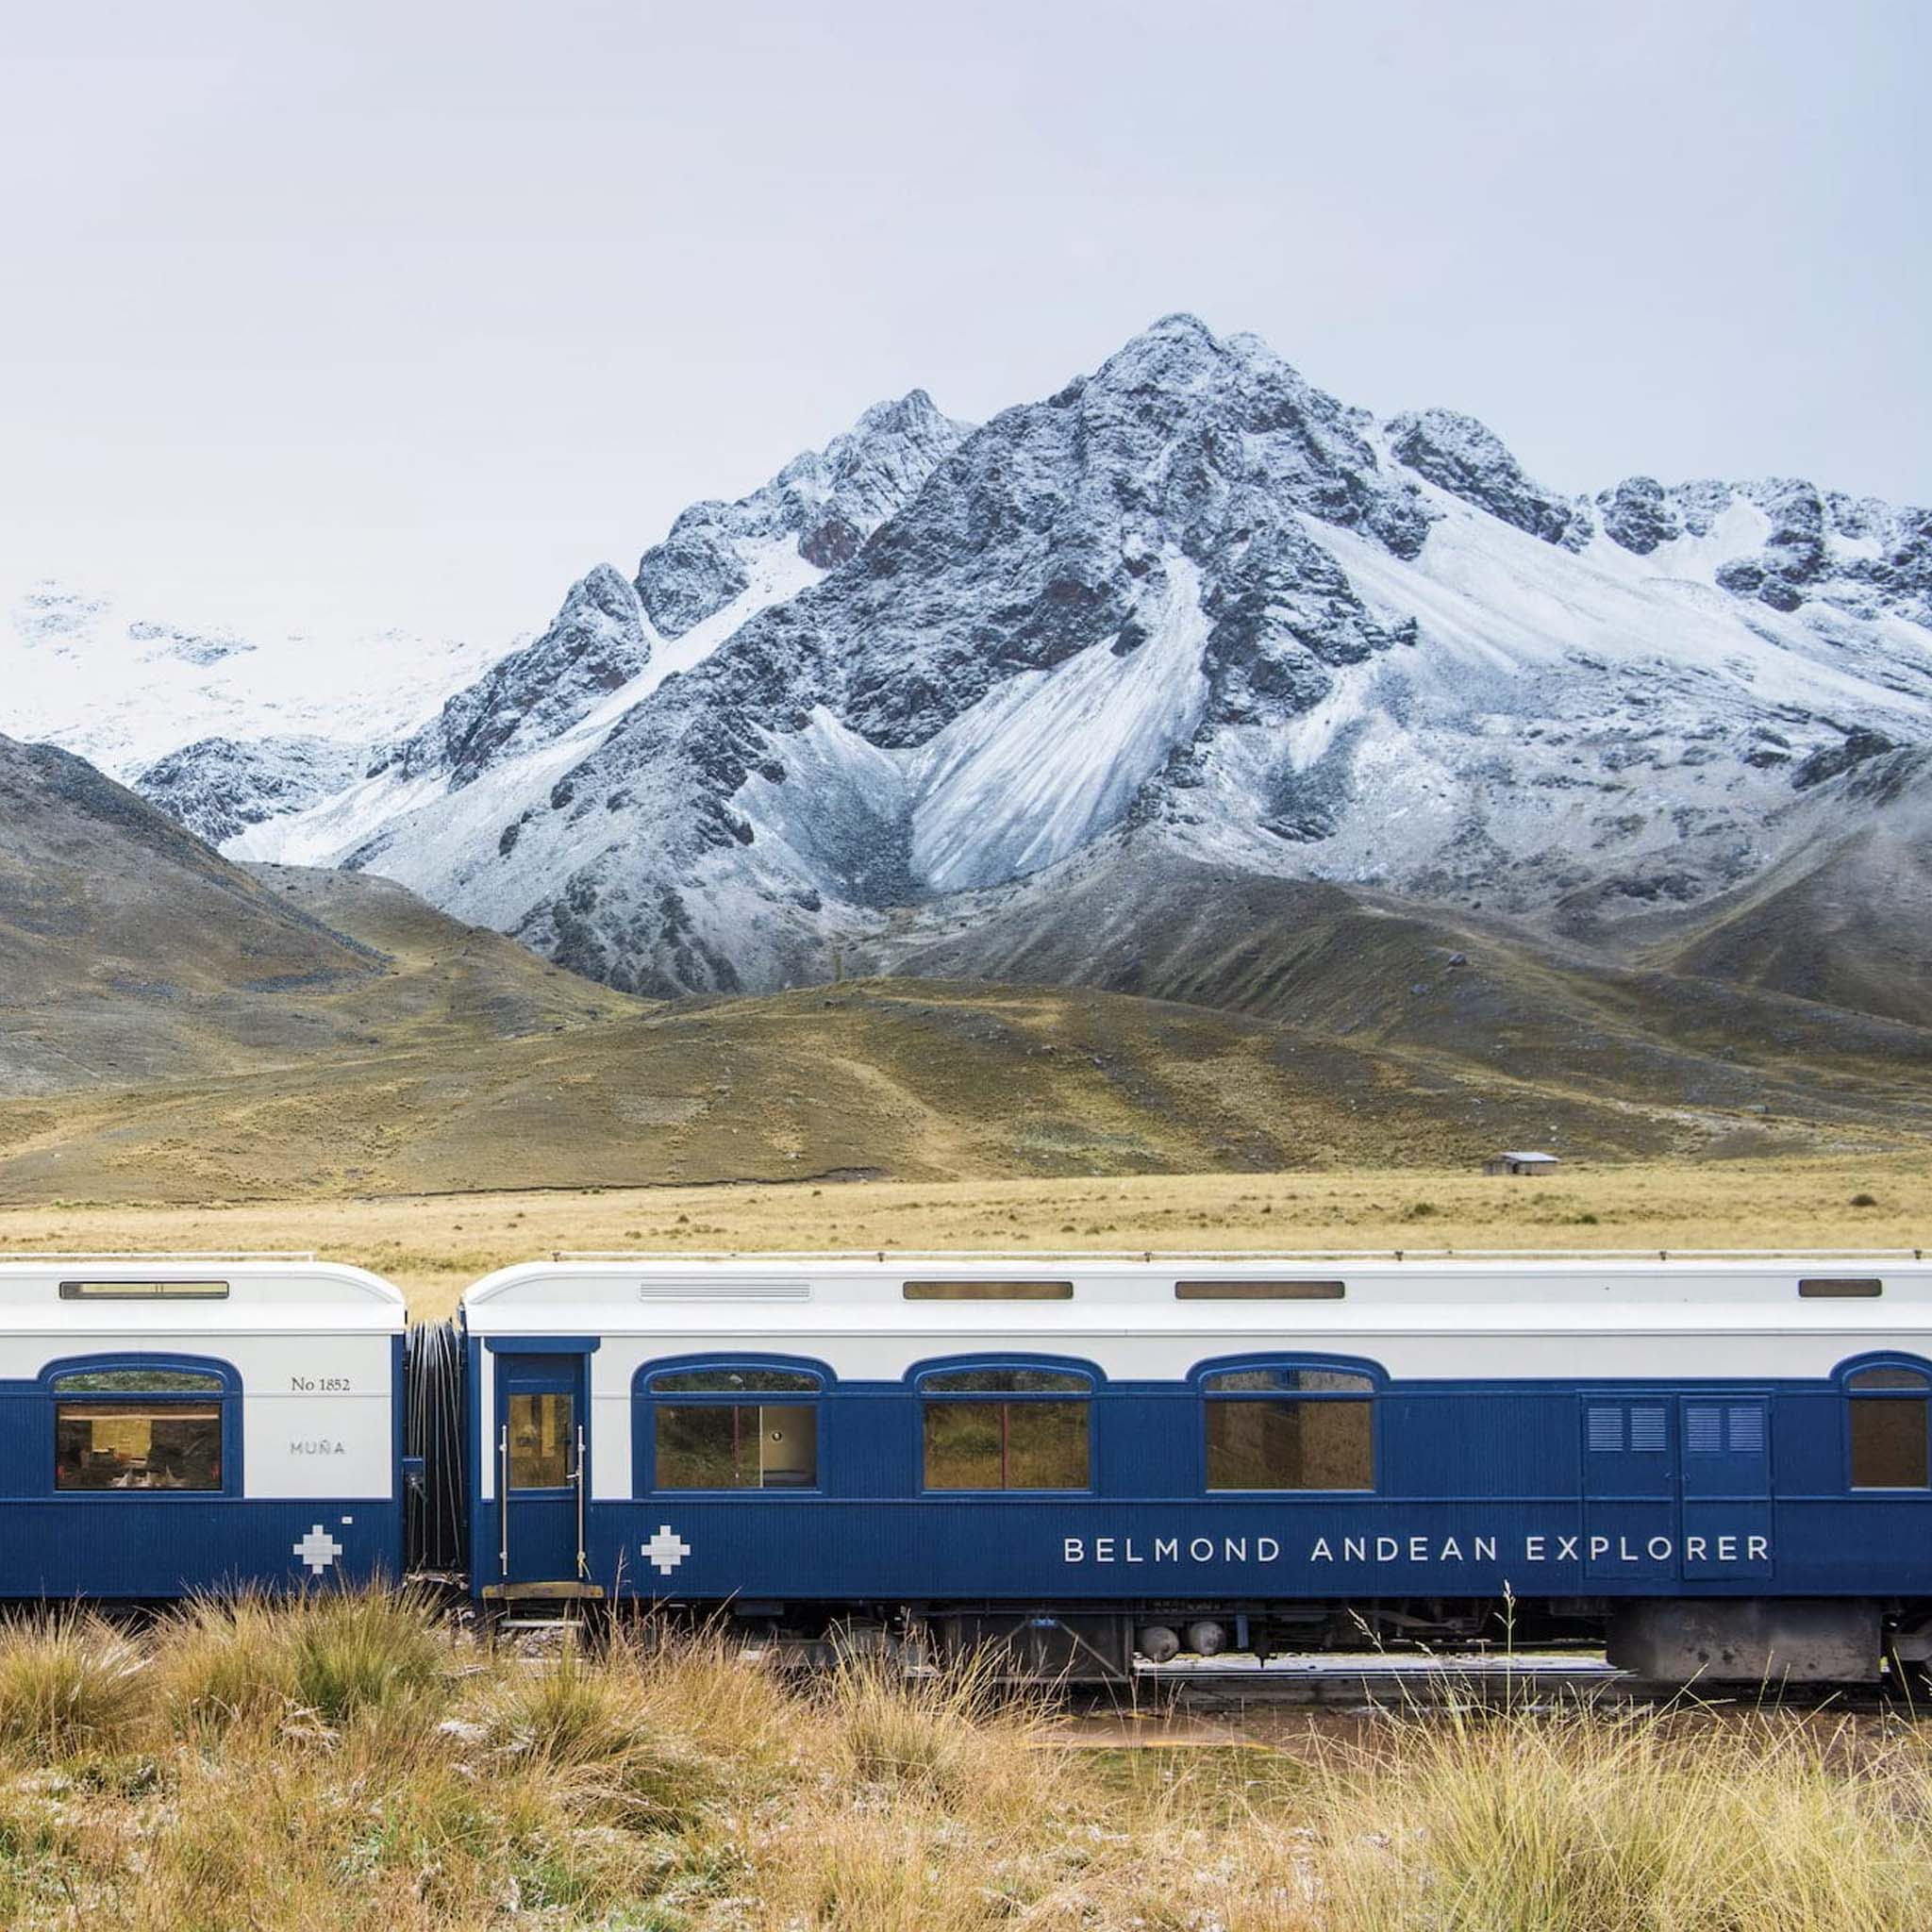 Voyages en train Trains Légende Mythiques Odysight Travel Experts